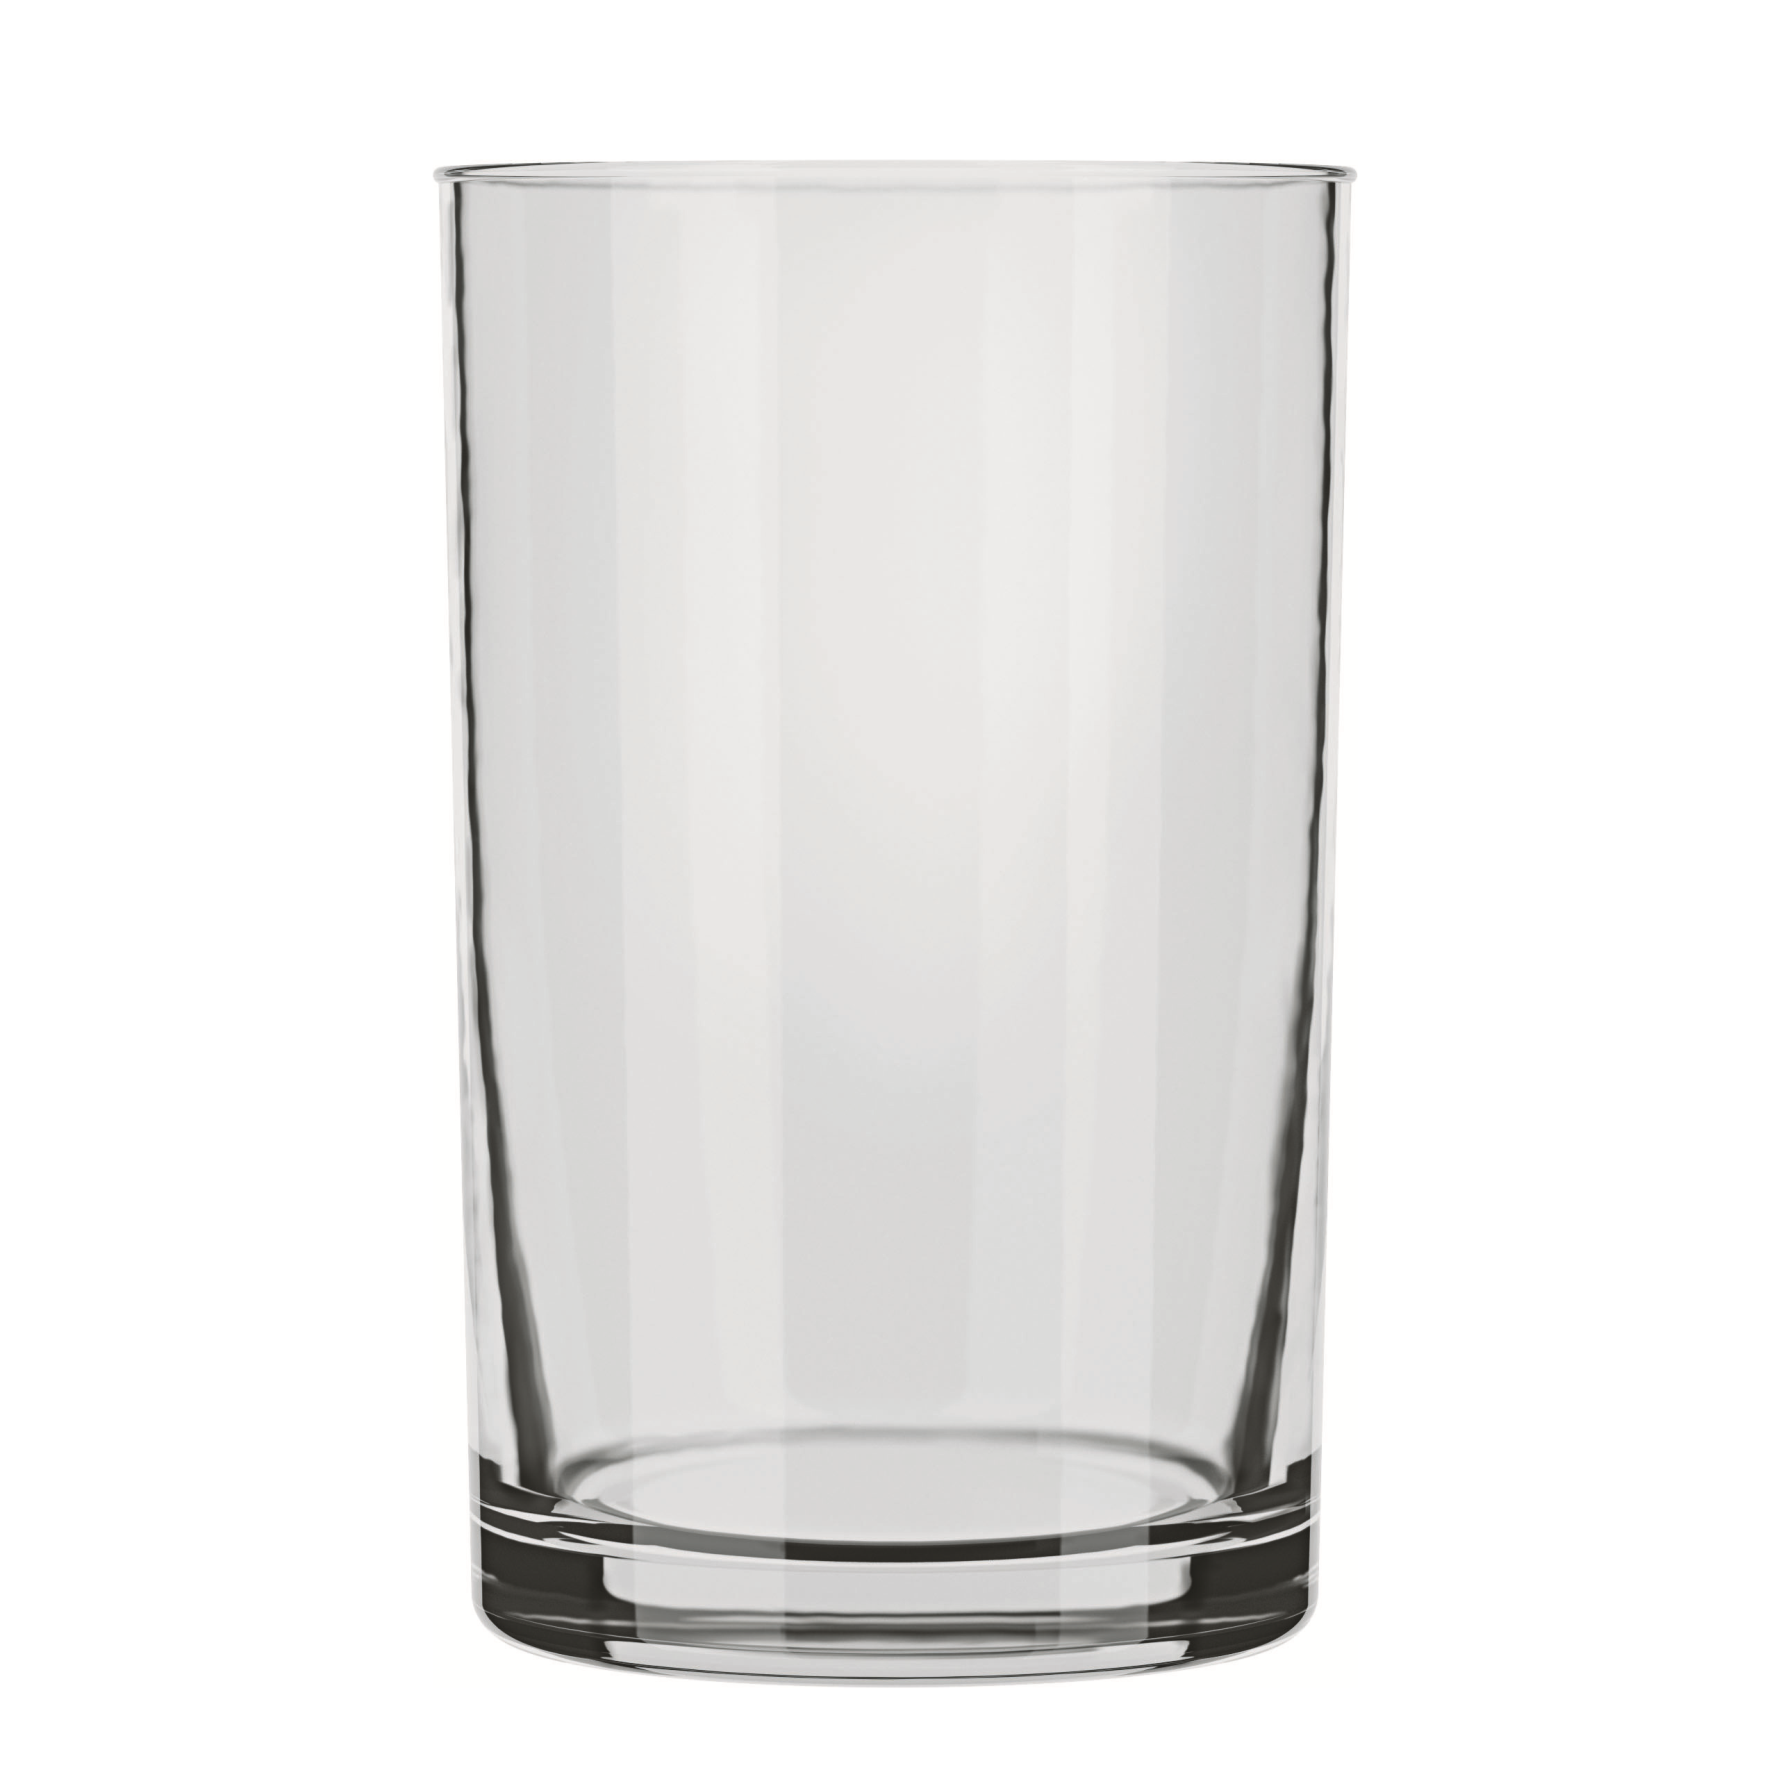 Copo de Suco de Vidro 200ml Transparente - Cylinder Nadir